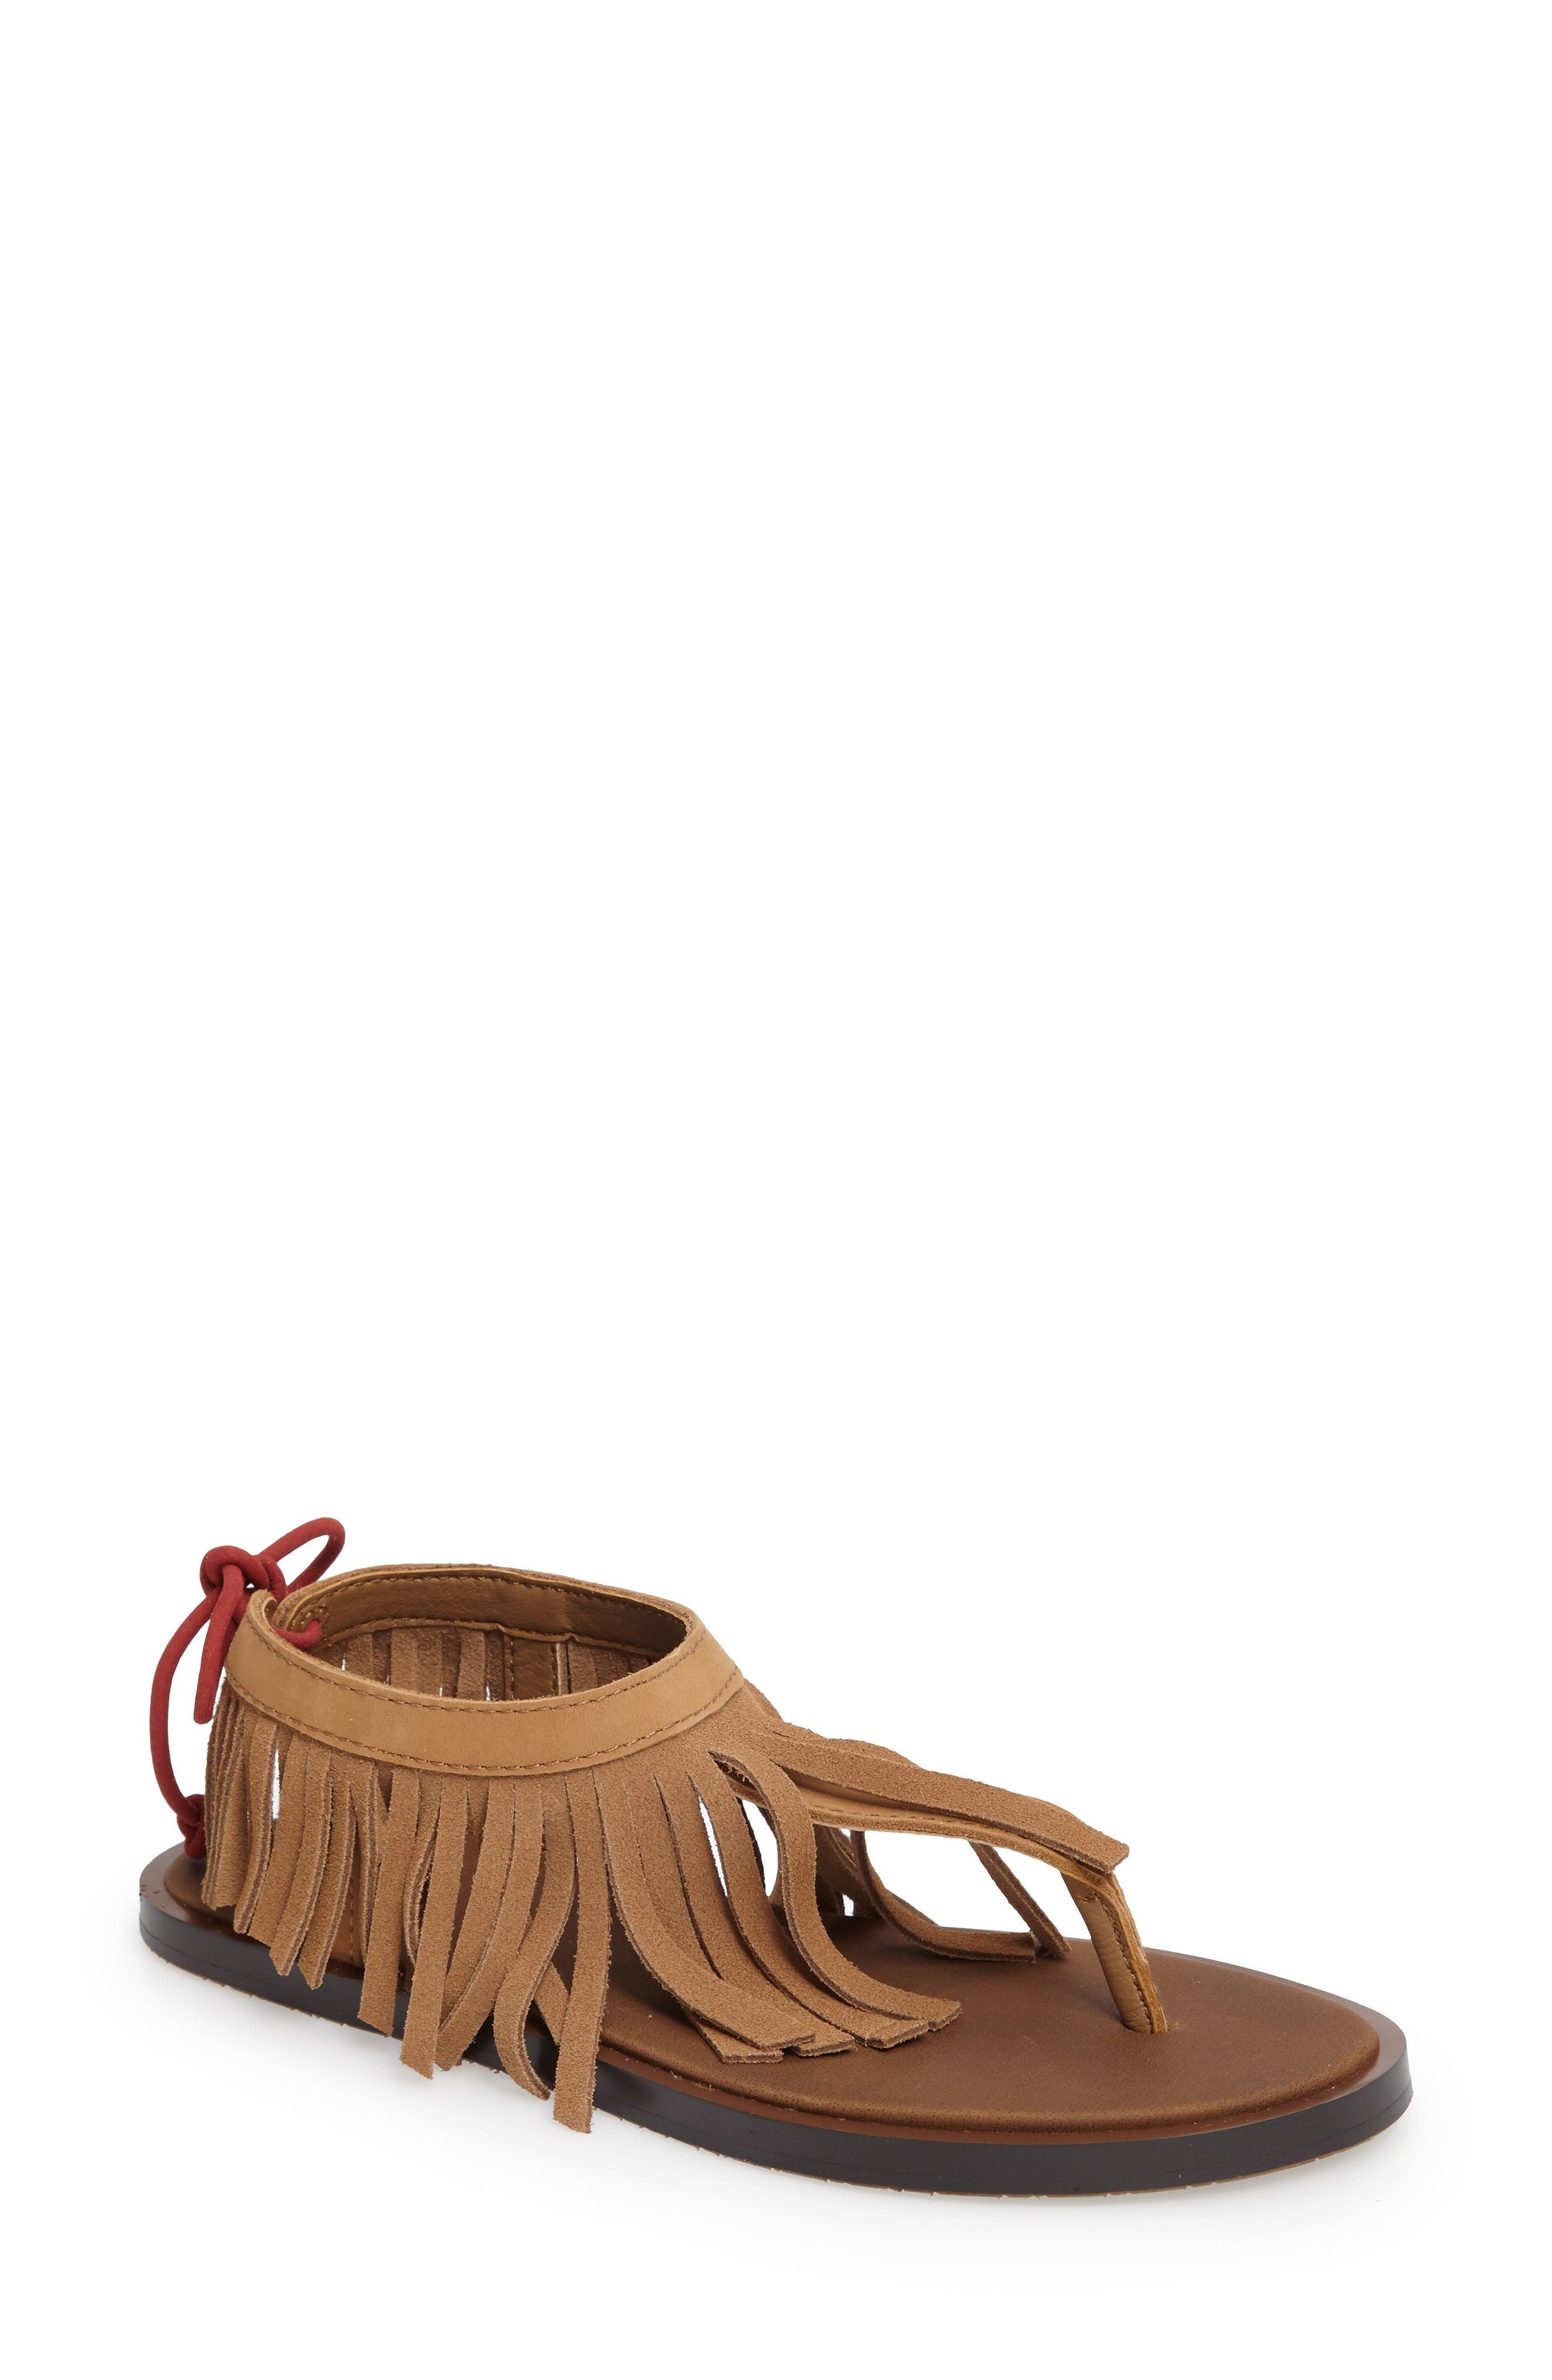 SANUK Yoga Fringe Sandal